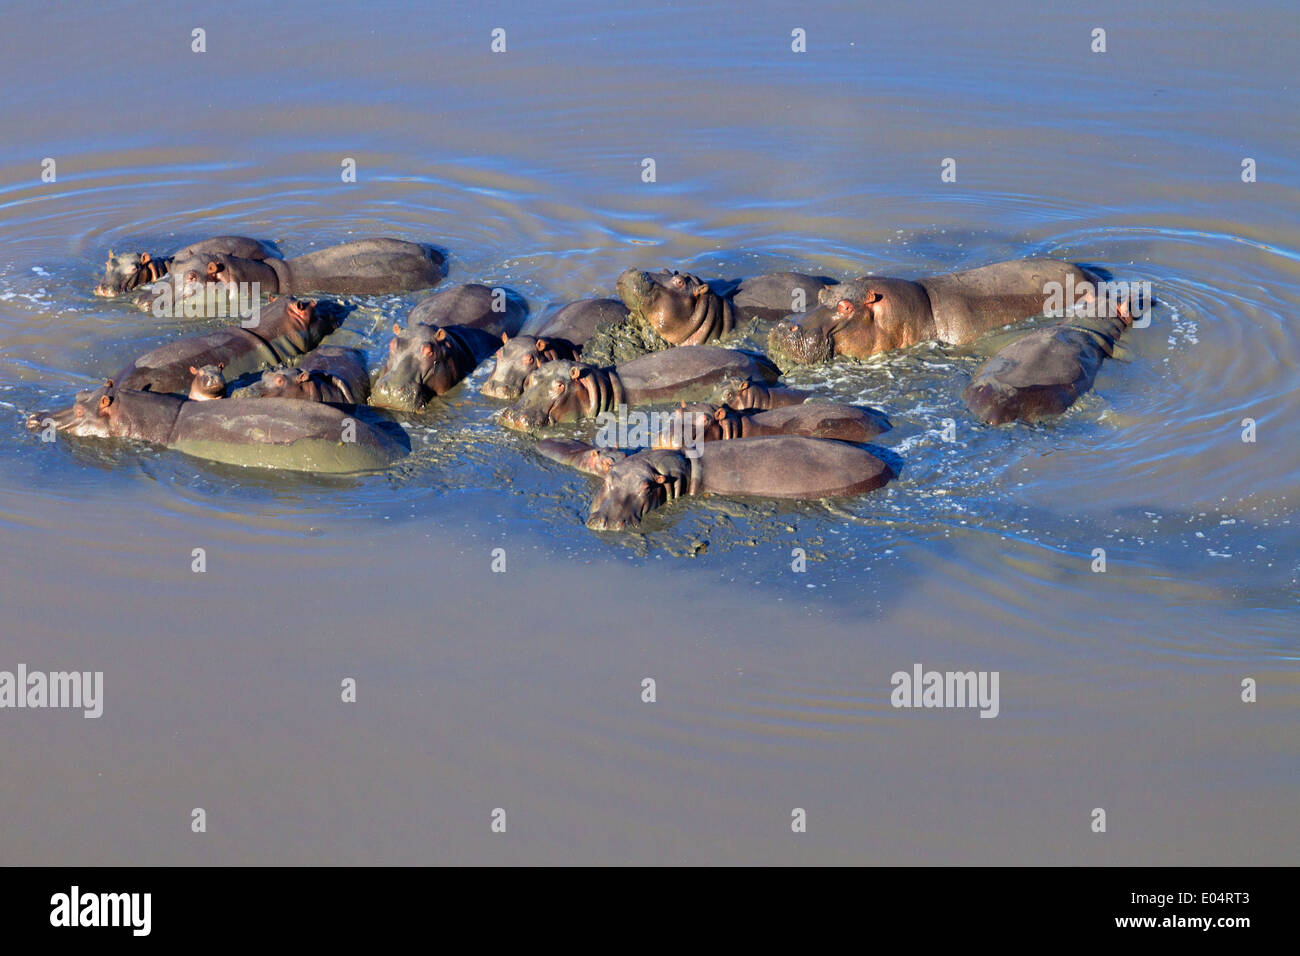 Aerial view of hippo in water.Hippopotamus. (Hippopotamus amphibius) South Africa - Stock Image